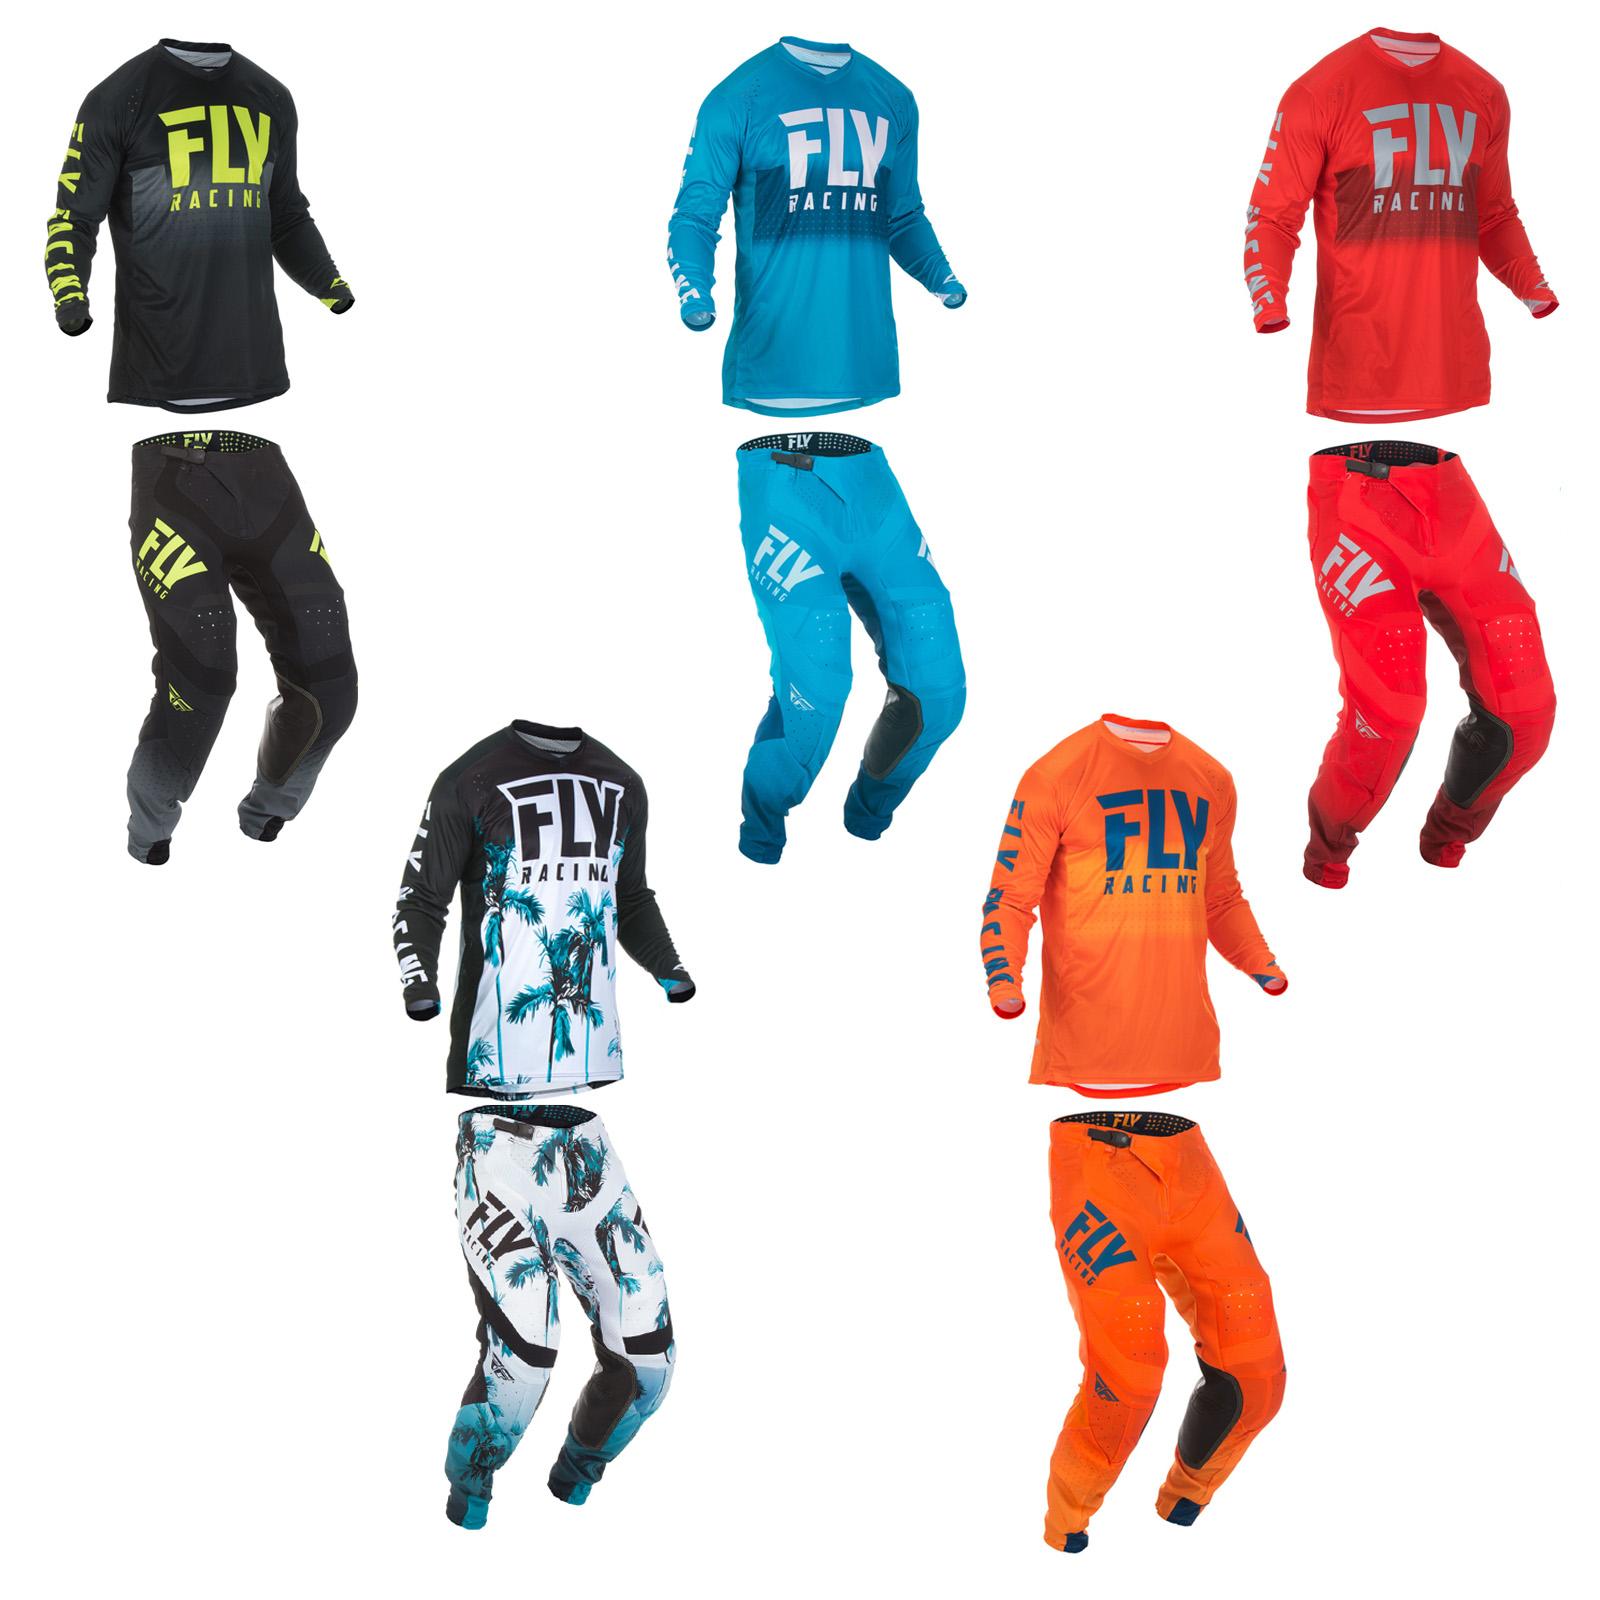 Fly Racing Lite Hydrogen Jersey Pants Combo ATV UTV Dirtbike Offroad MX Paradise